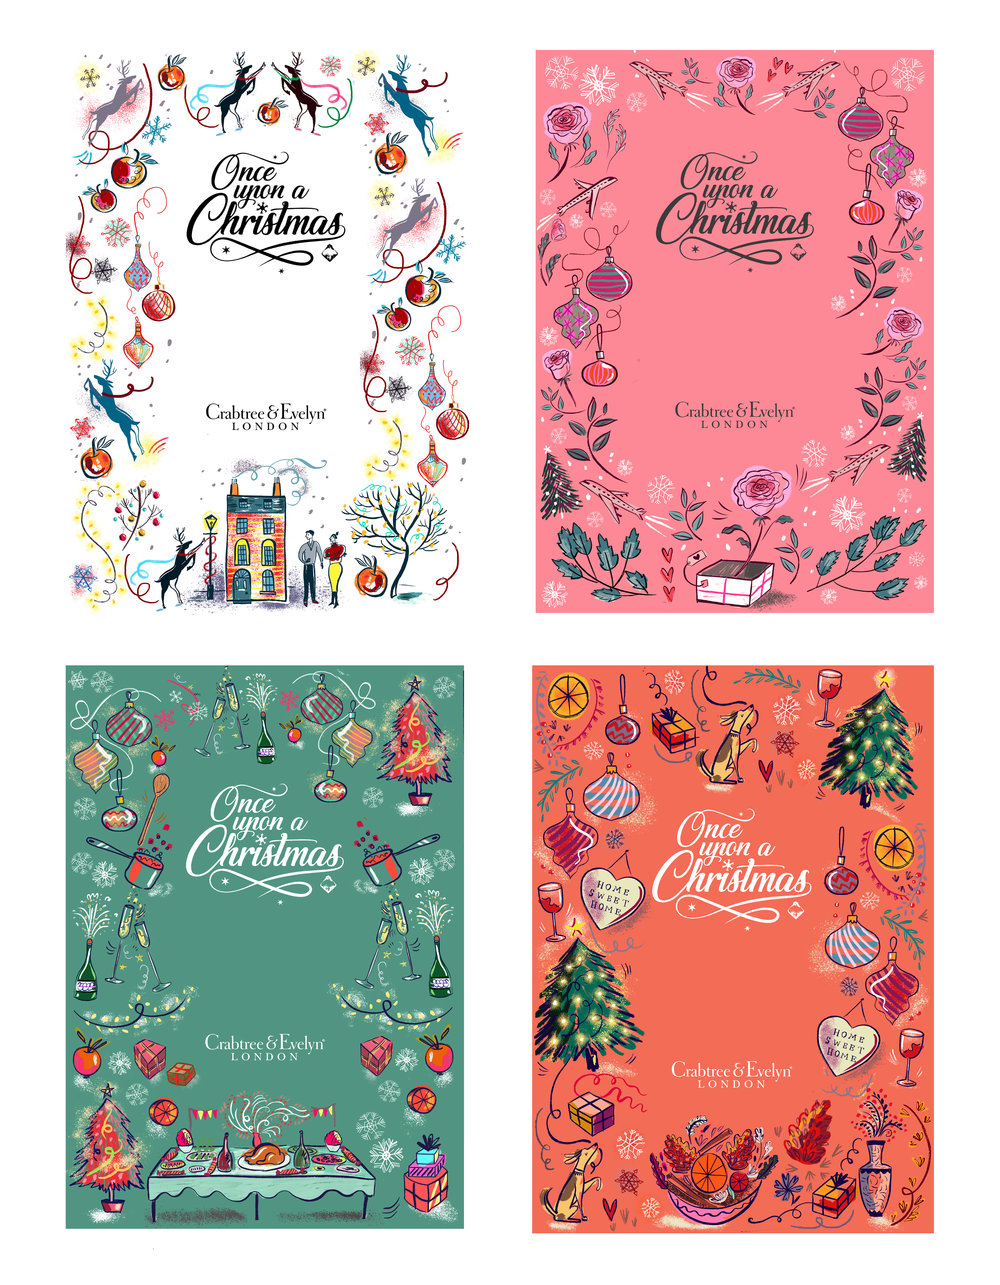 c&e 4 images christmas.jpg